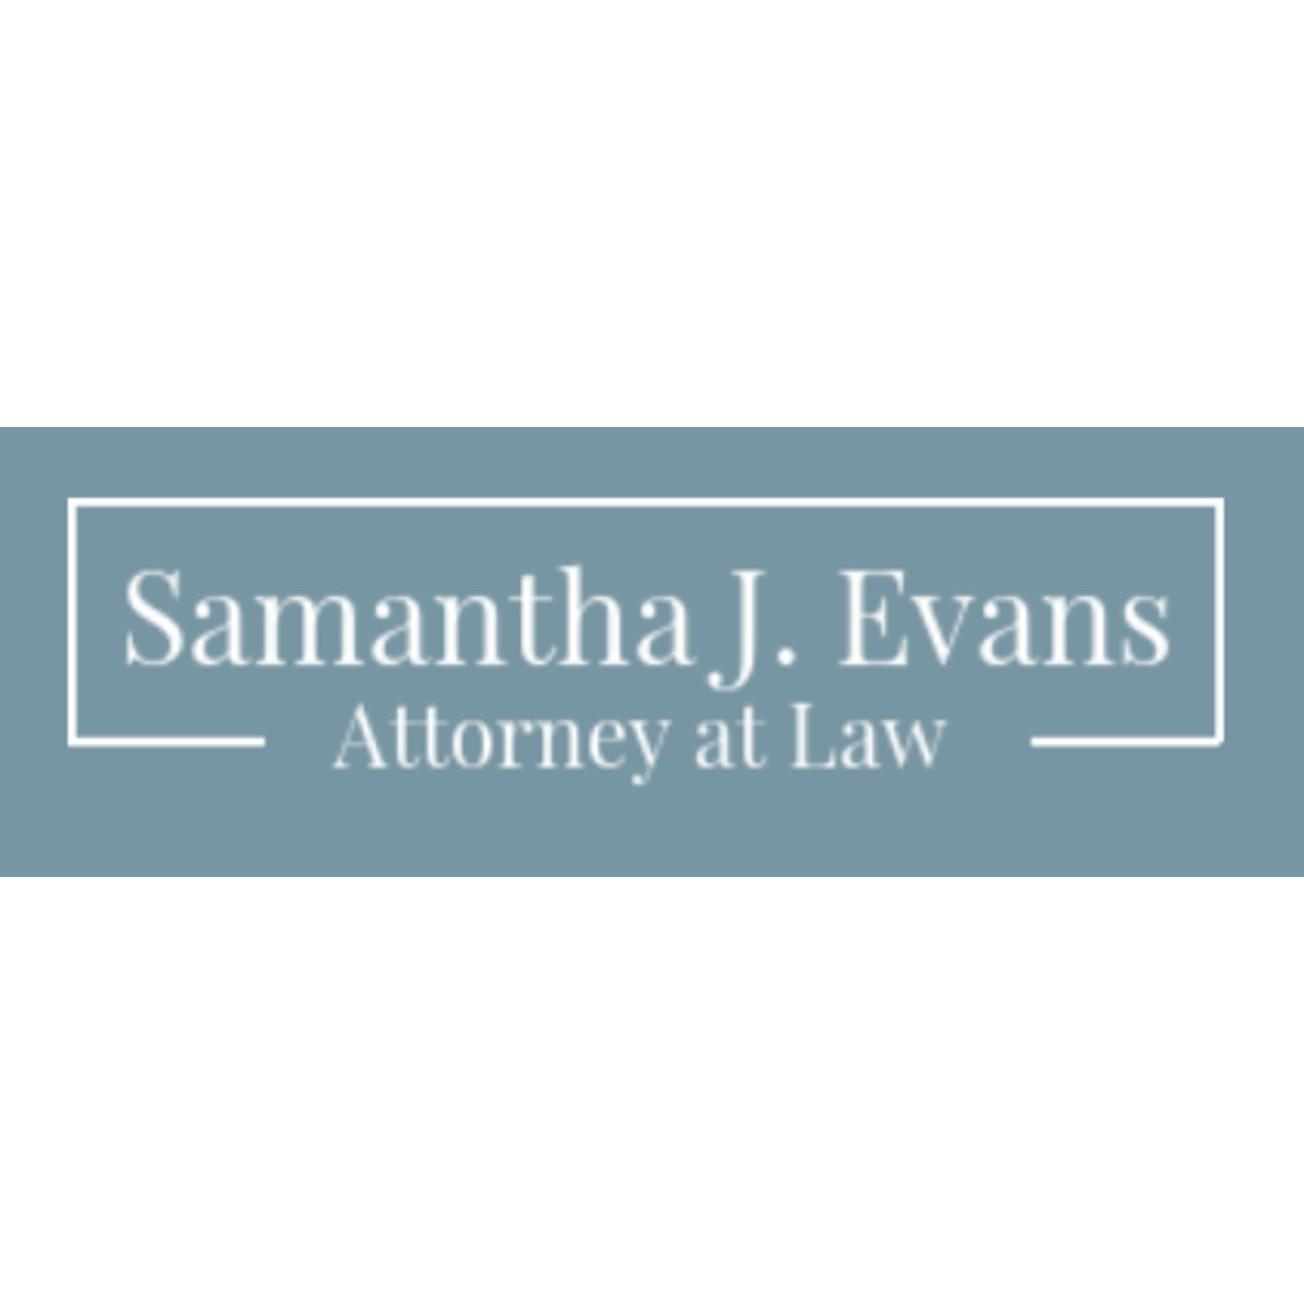 Samantha J. Evans, Attorney At Law